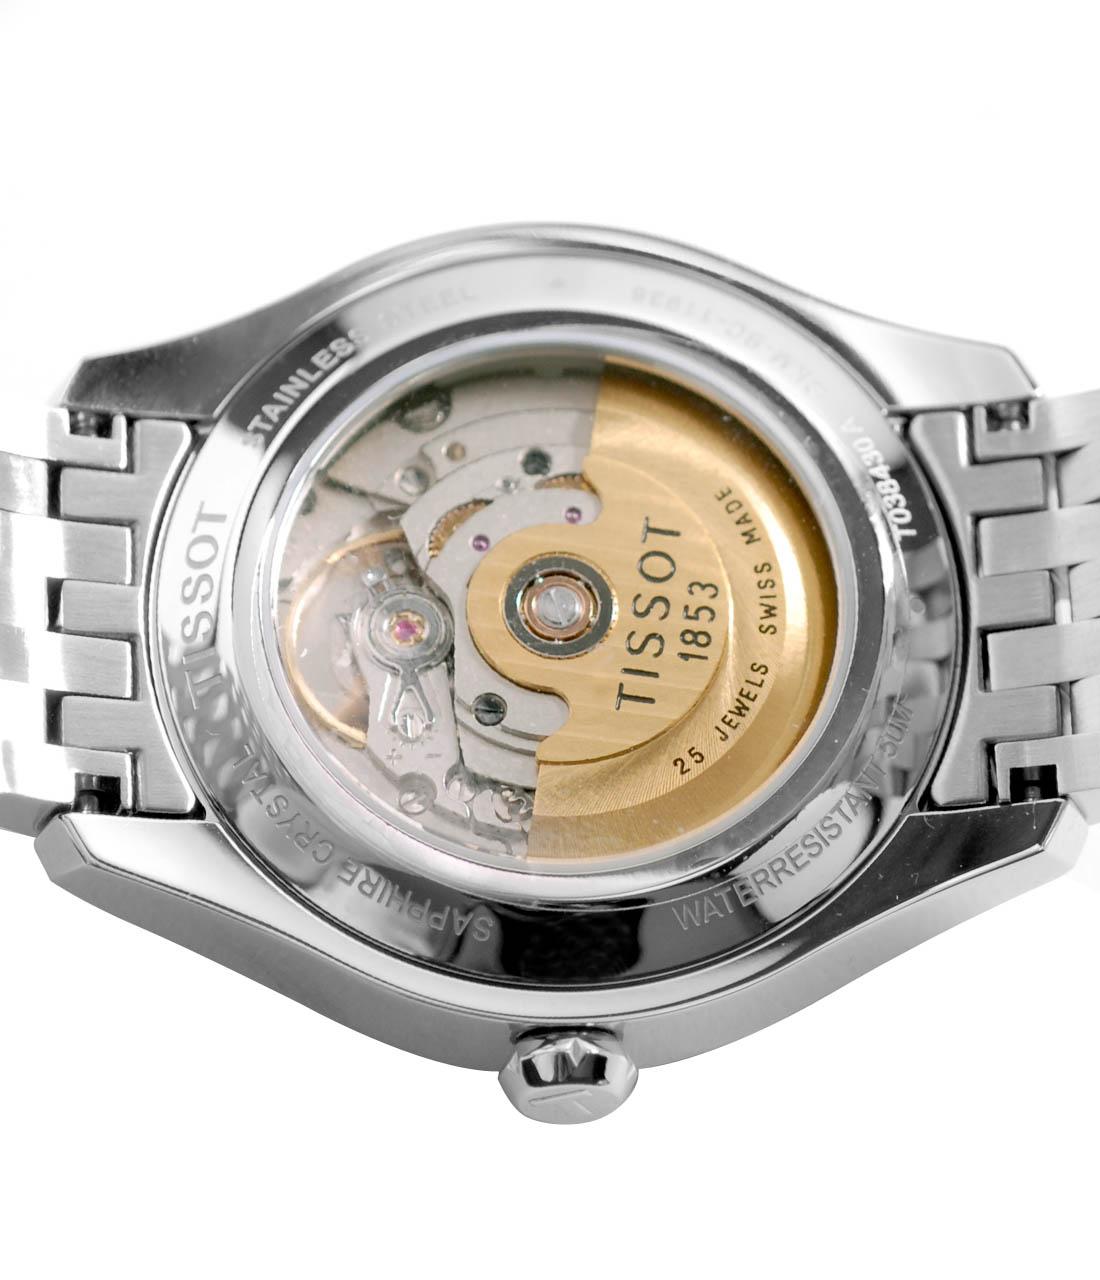 Mặt lưng Đồng hồ cơ nam Tissot 1853 T038.207.22.037.00